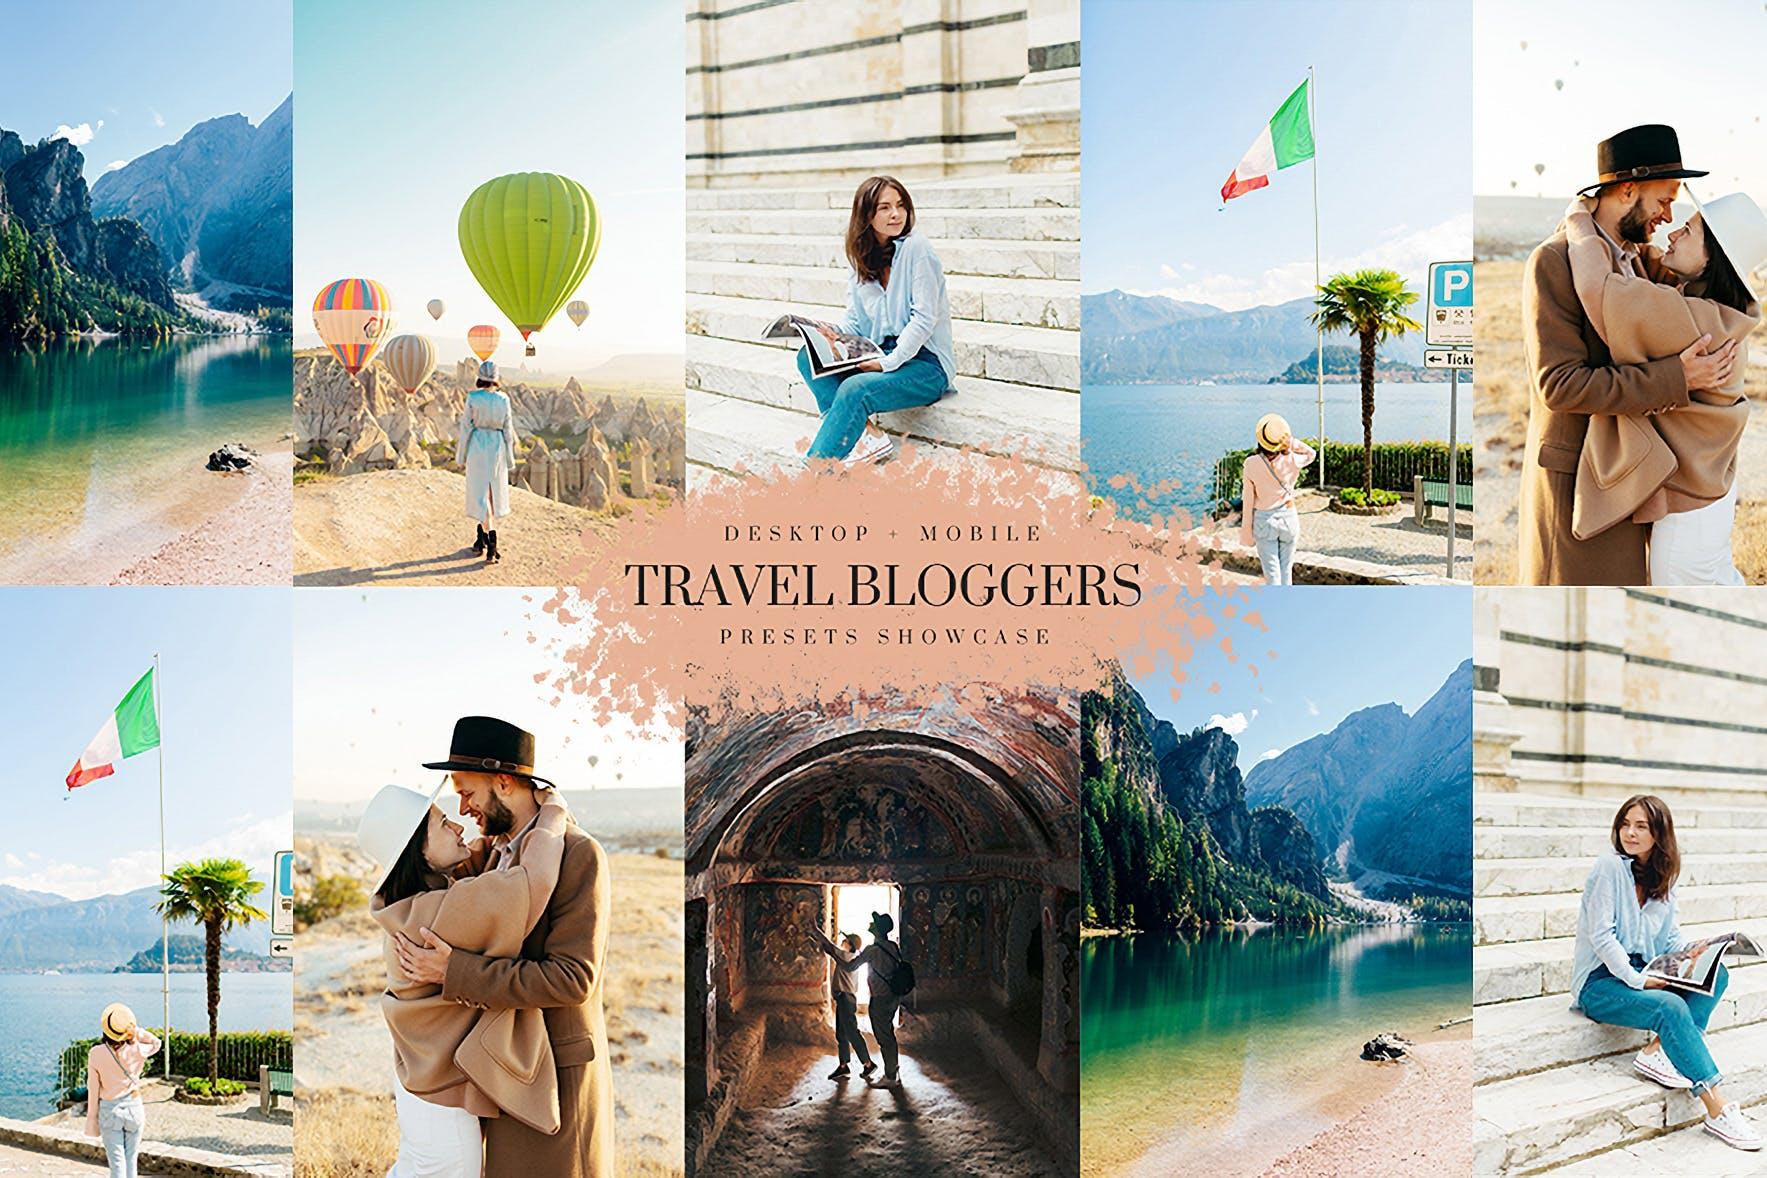 Instagram Presets for Travel Bloggers